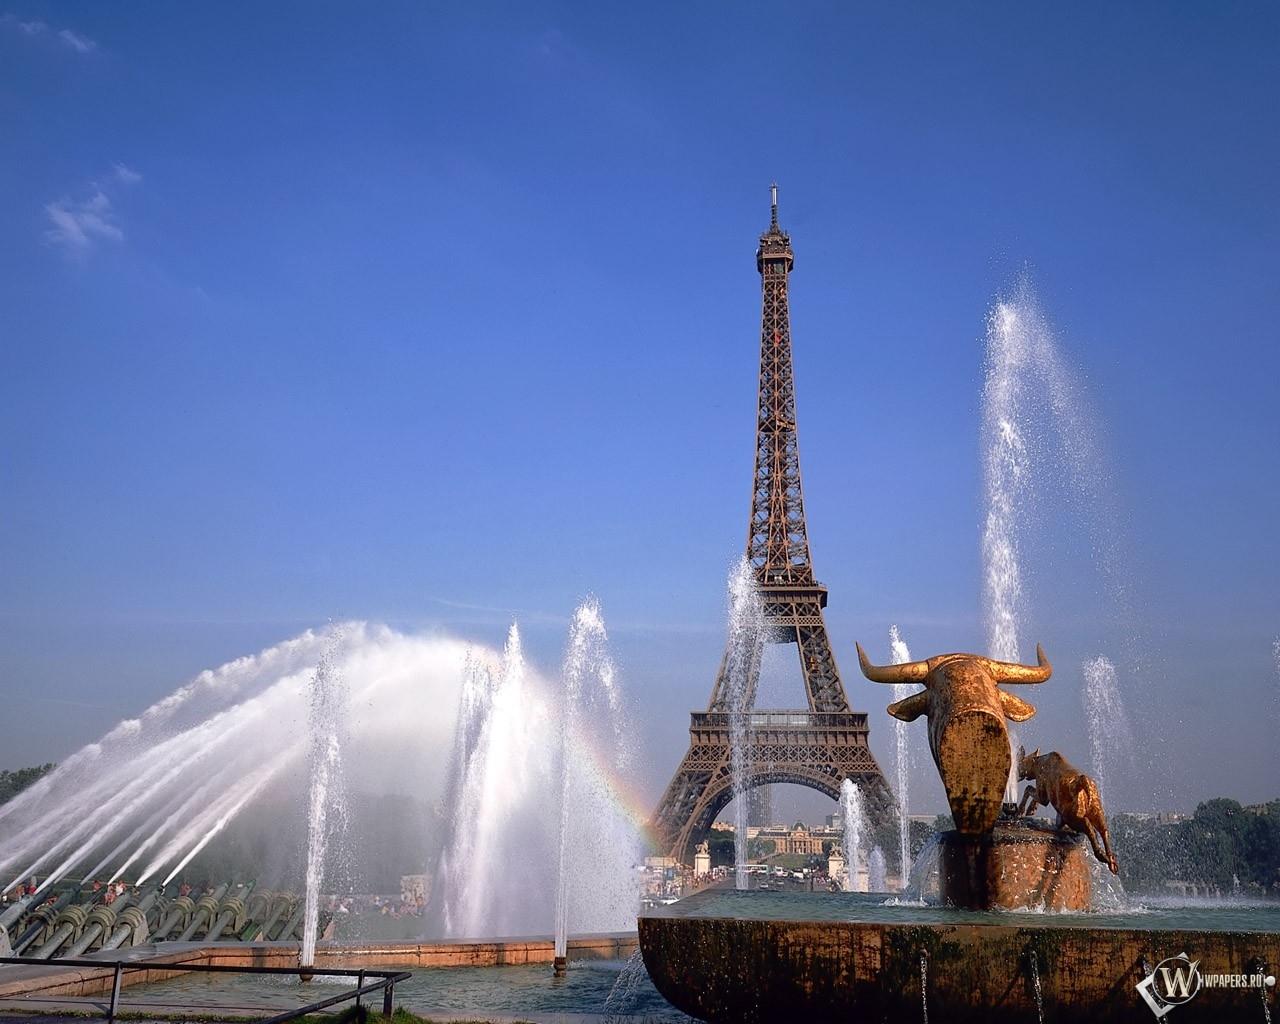 Эйфелева башня на фоне фонтана 1280x1024